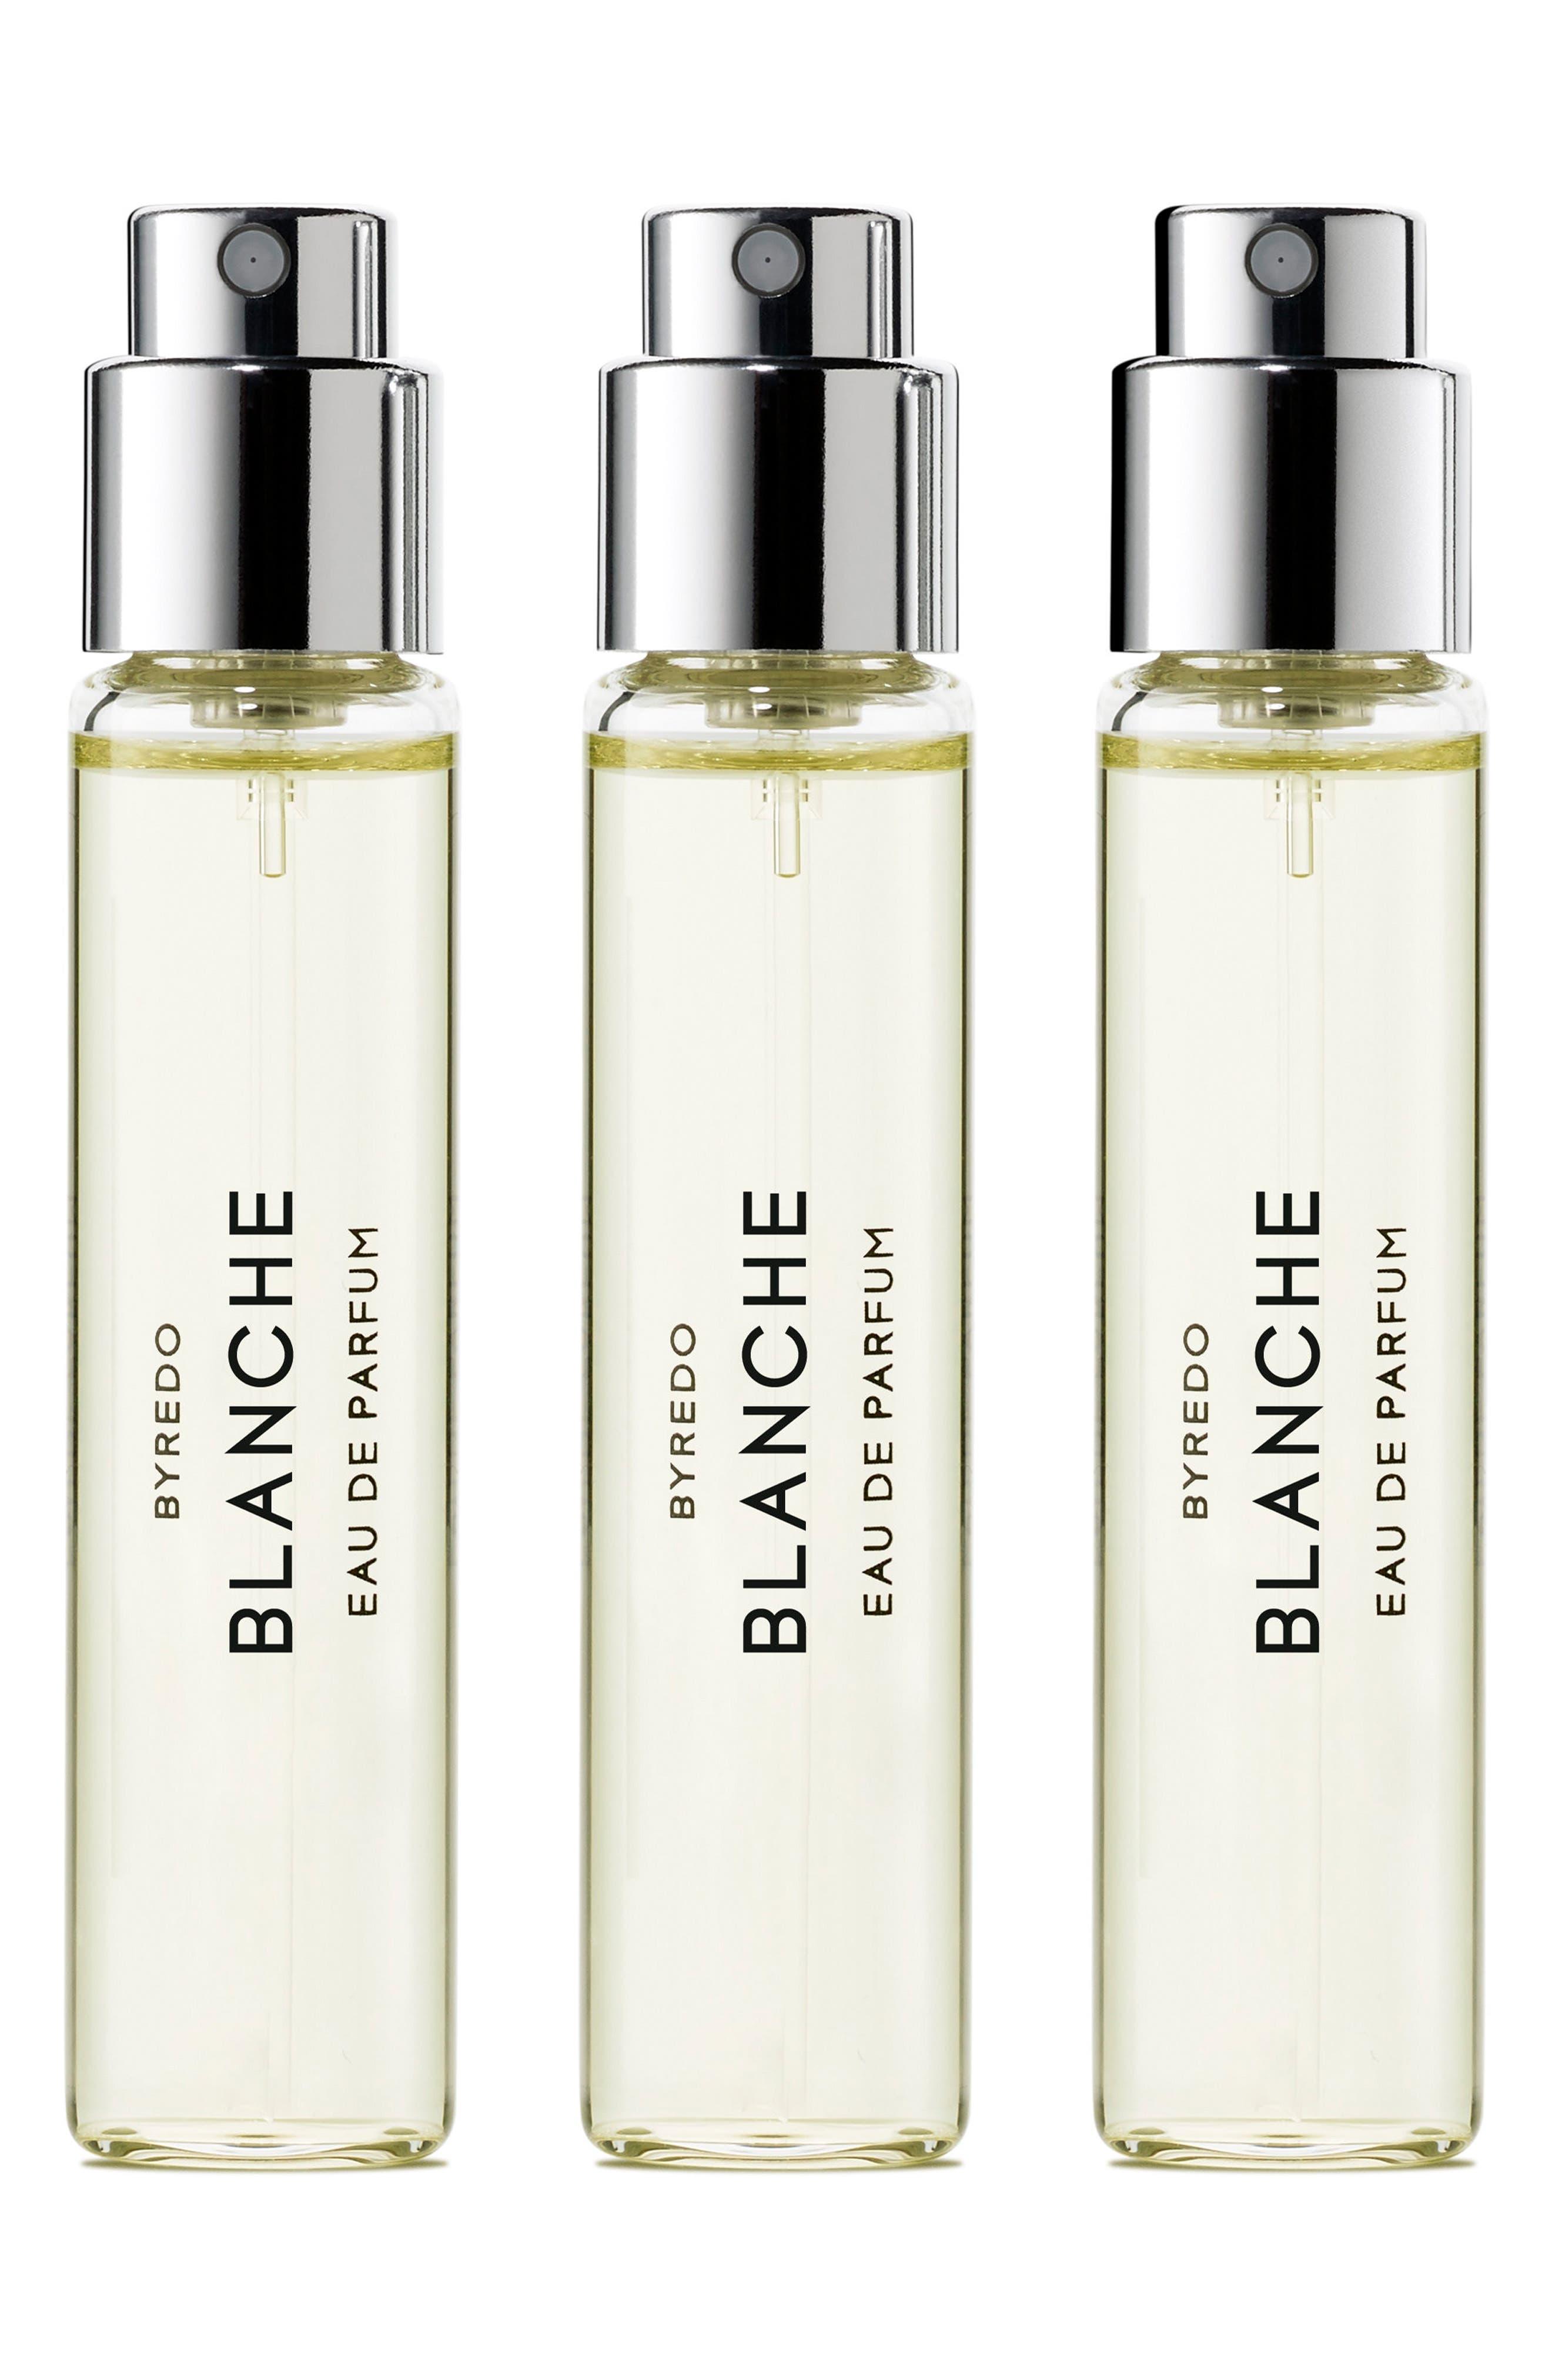 Alternate Image 1 Selected - BYREDO Blanche Eau de Parfum Travel Spray Trio